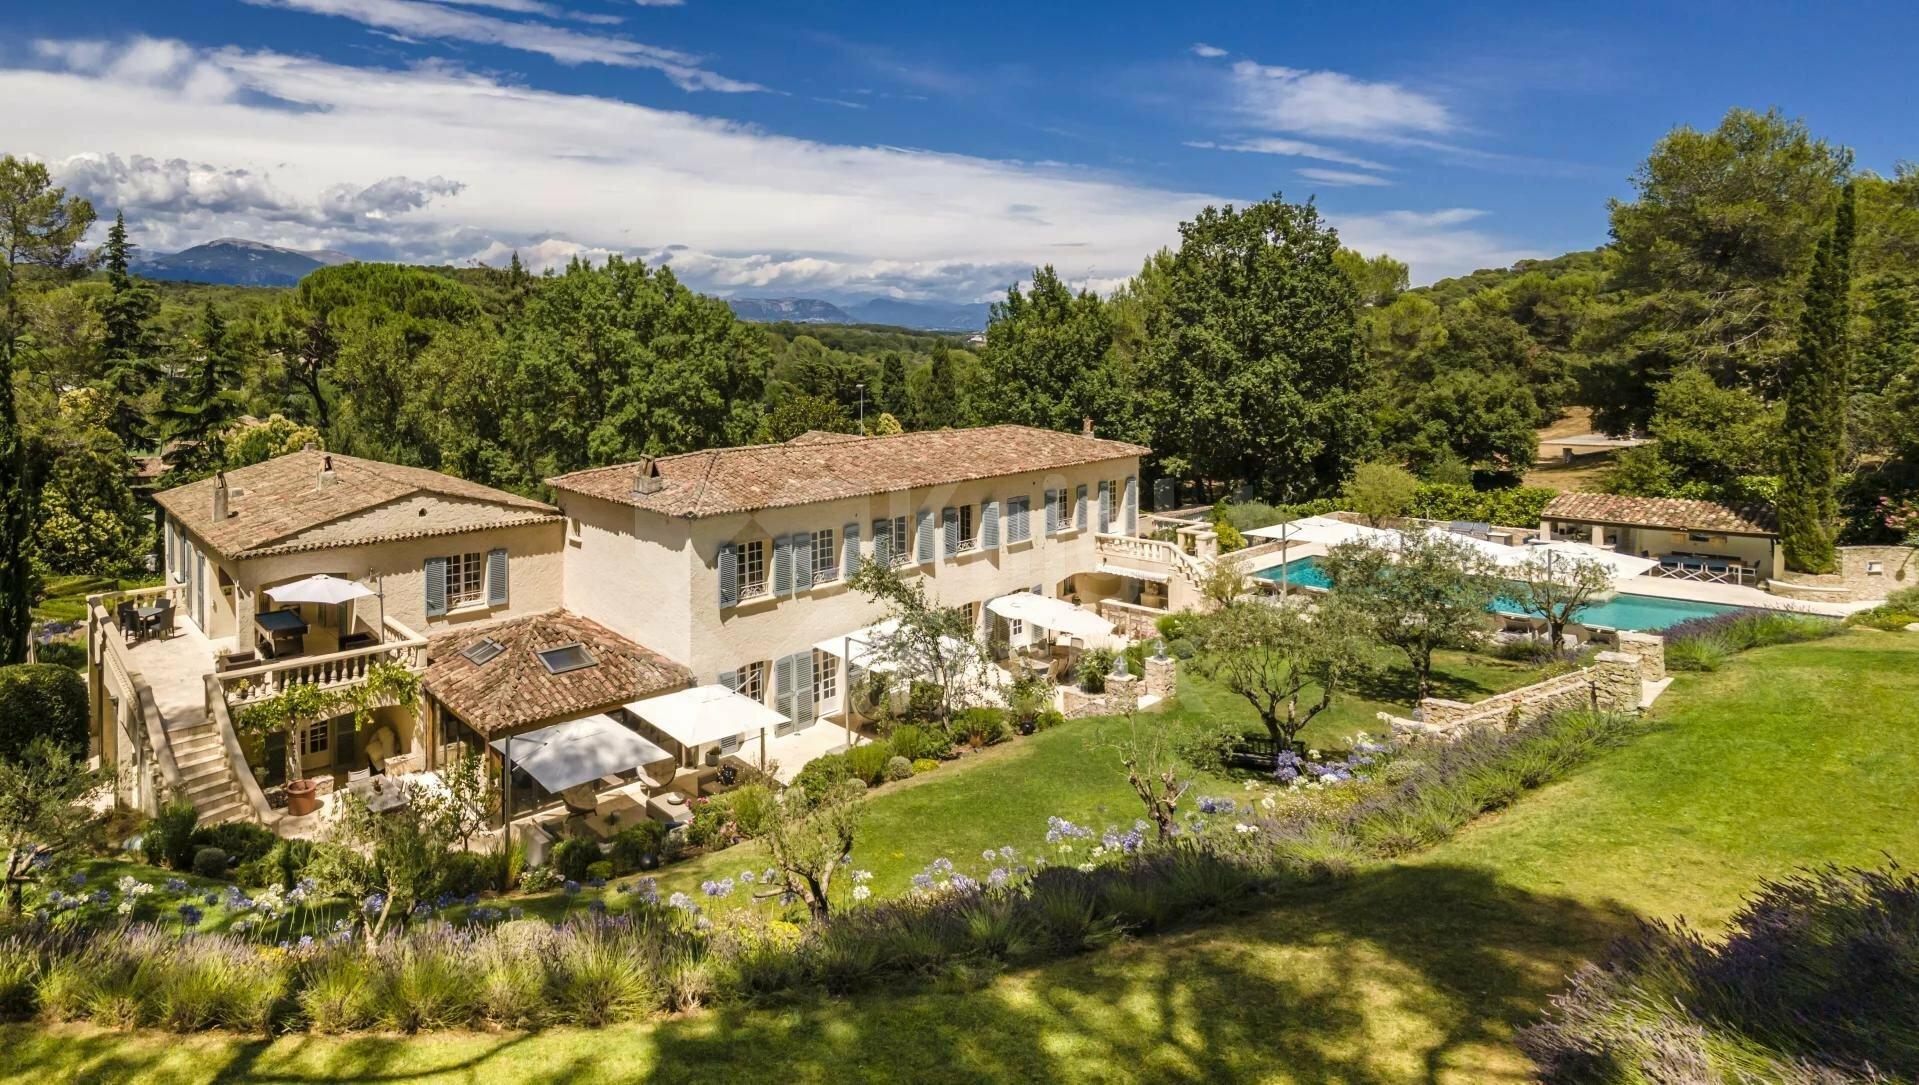 Villa in Mougins, Provence-Alpes-Côte d'Azur, France 1 - 11282126